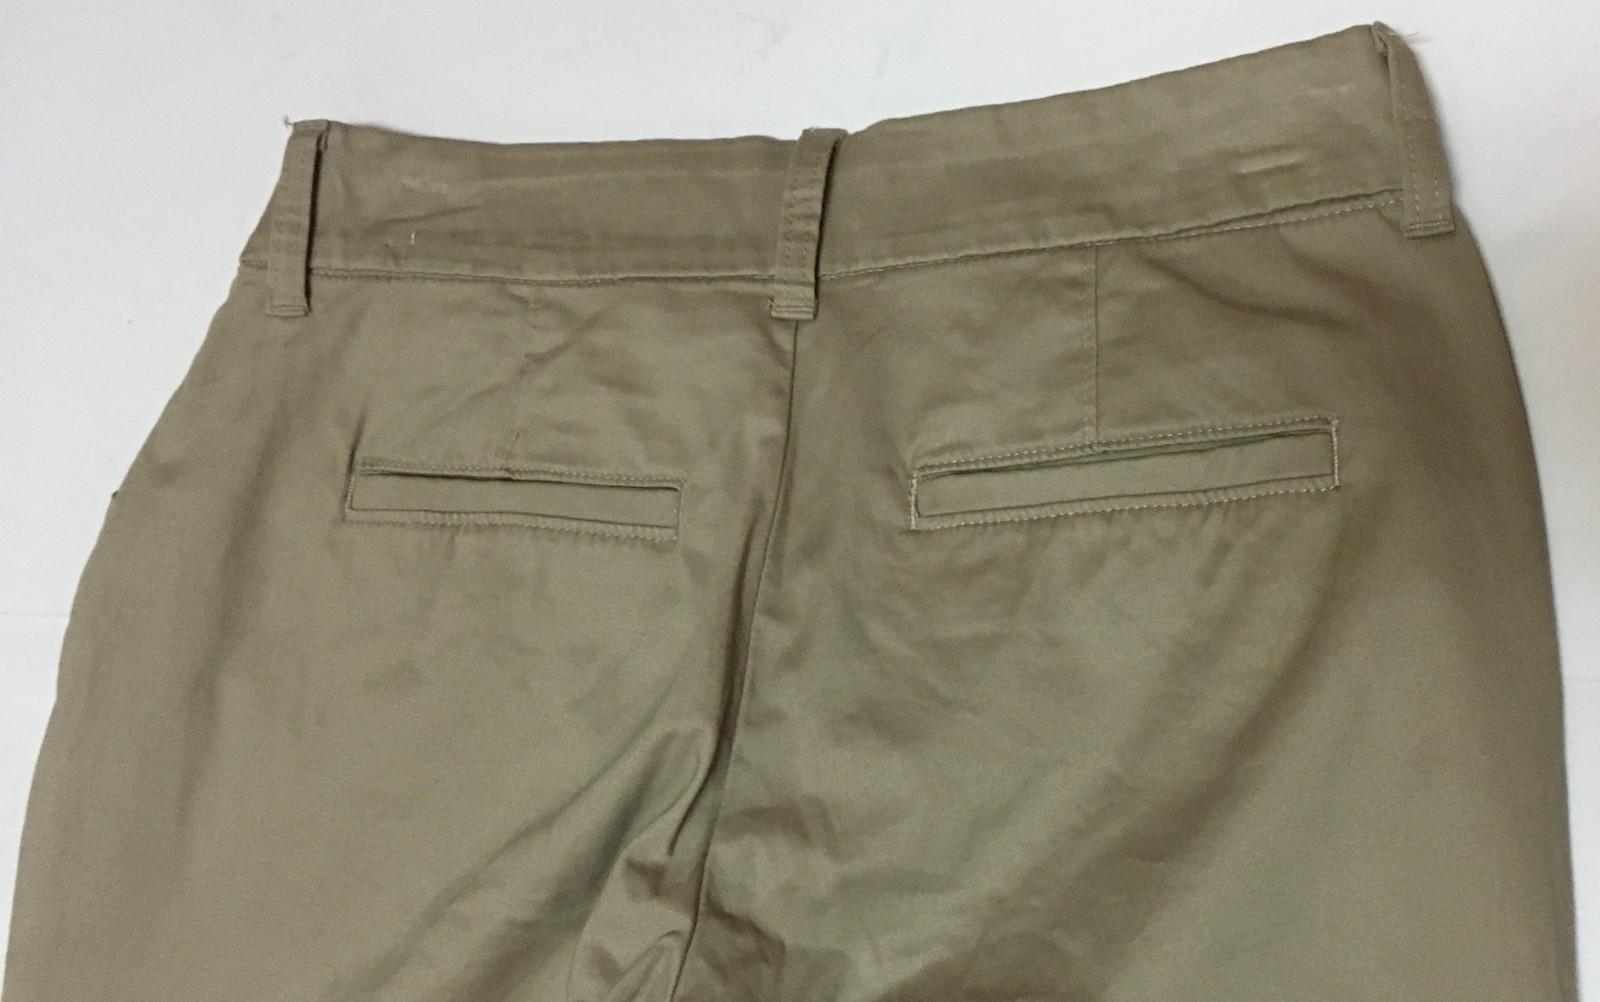 Lee Riders Curvy Trouser Women's Beige Pants Sz 8P